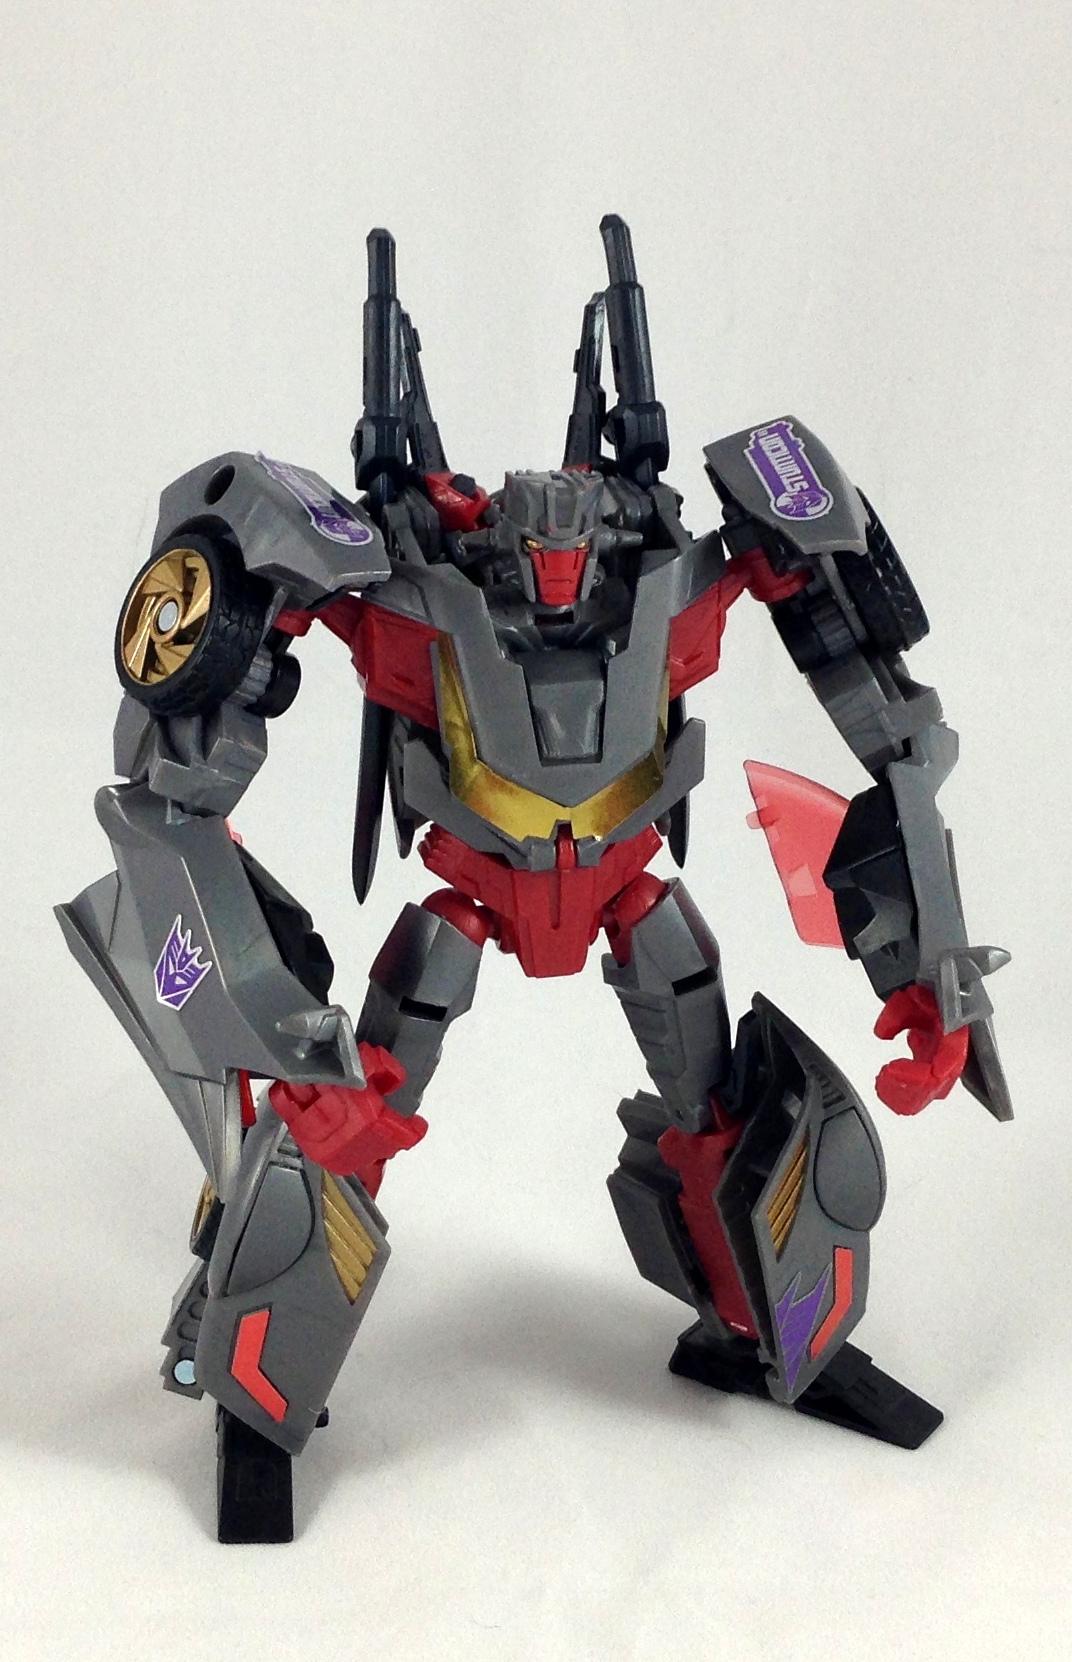 Takara Transformers Prime Am 32 Wildrider Pax Cybertron